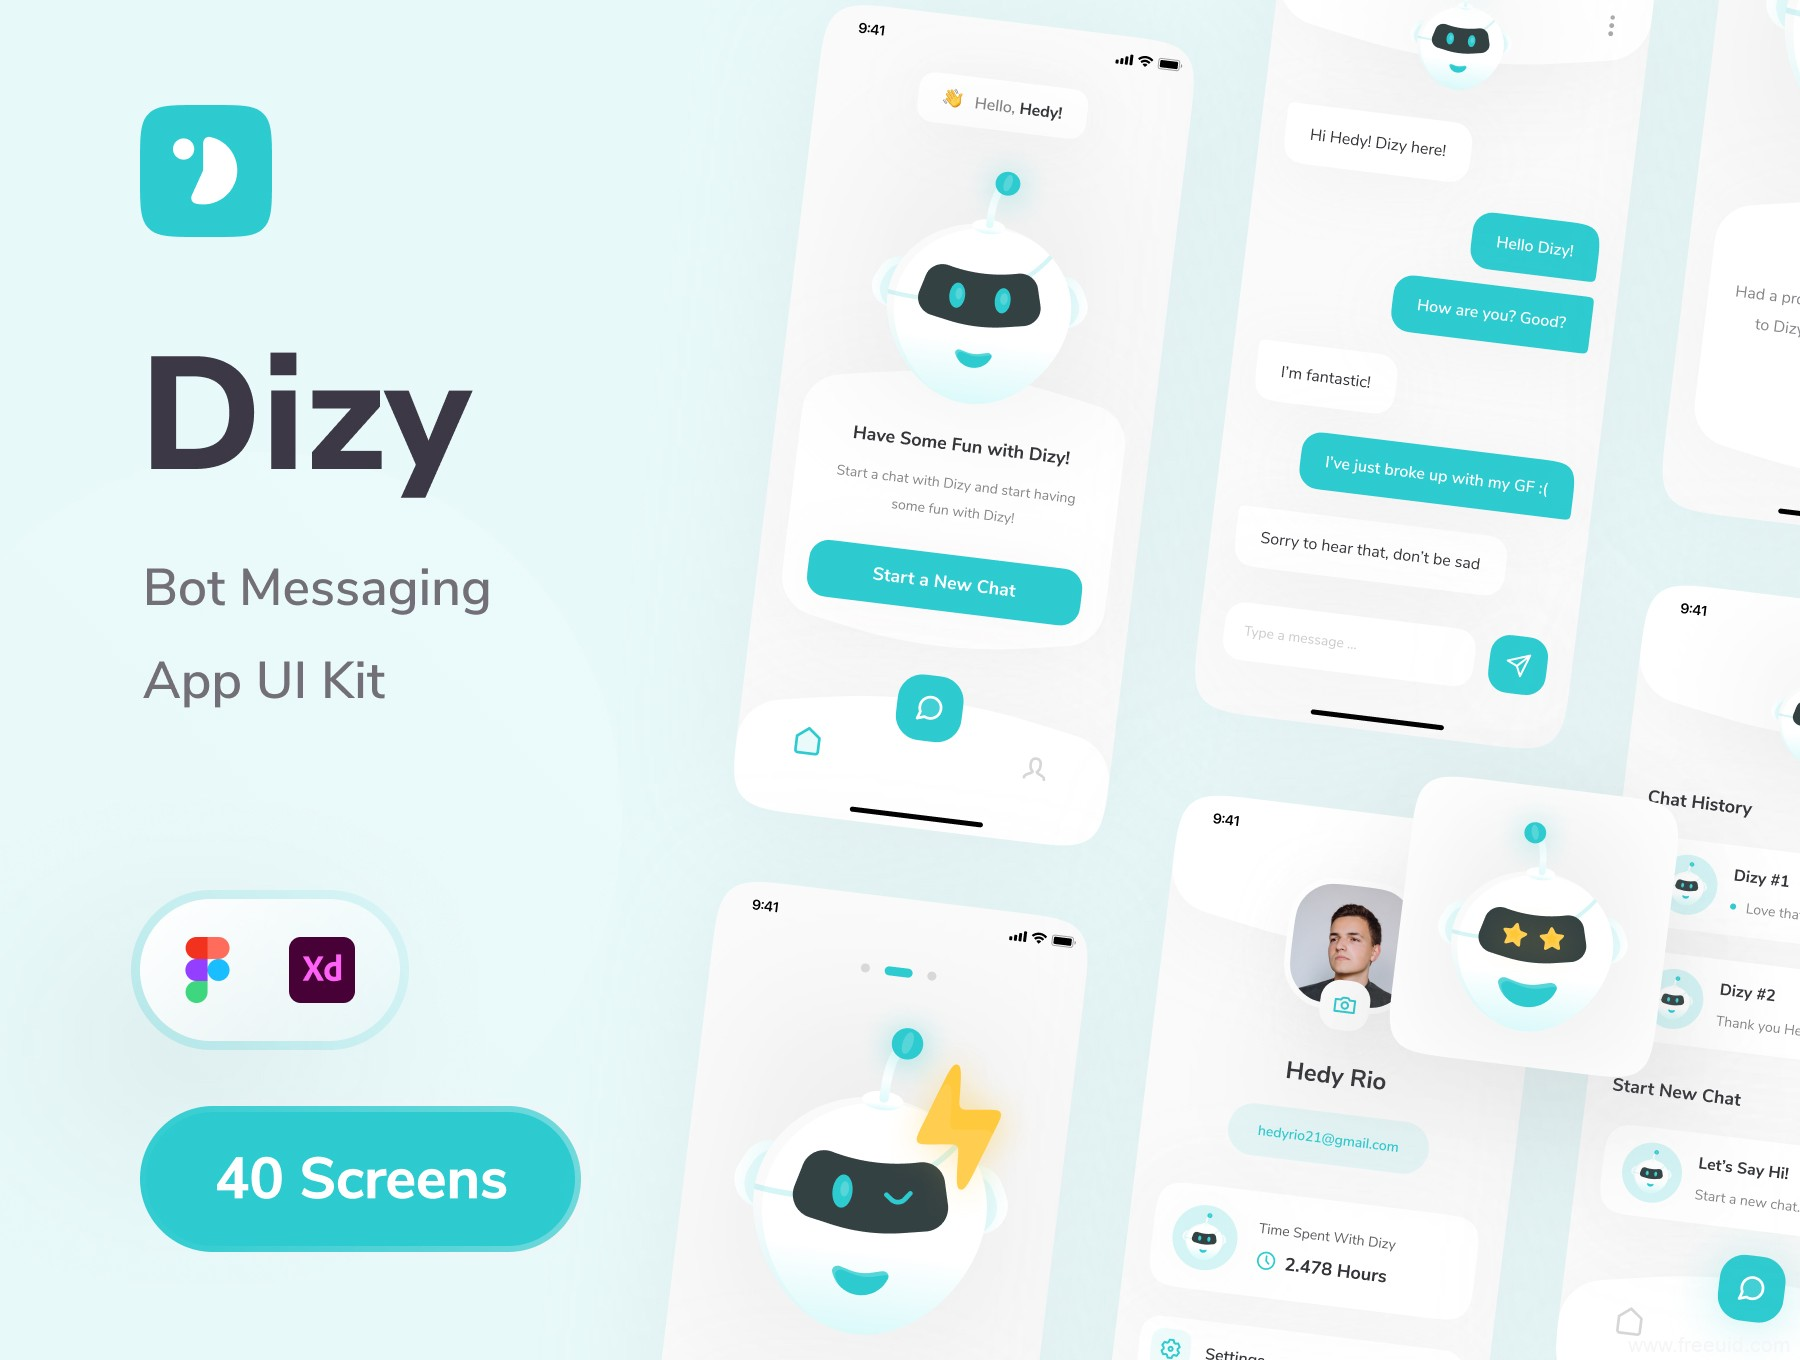 AI助手app ui资源下载,聊天机器人应用UI kit,人工智能聊天客服系统UI设计素材,xd、fig源文件